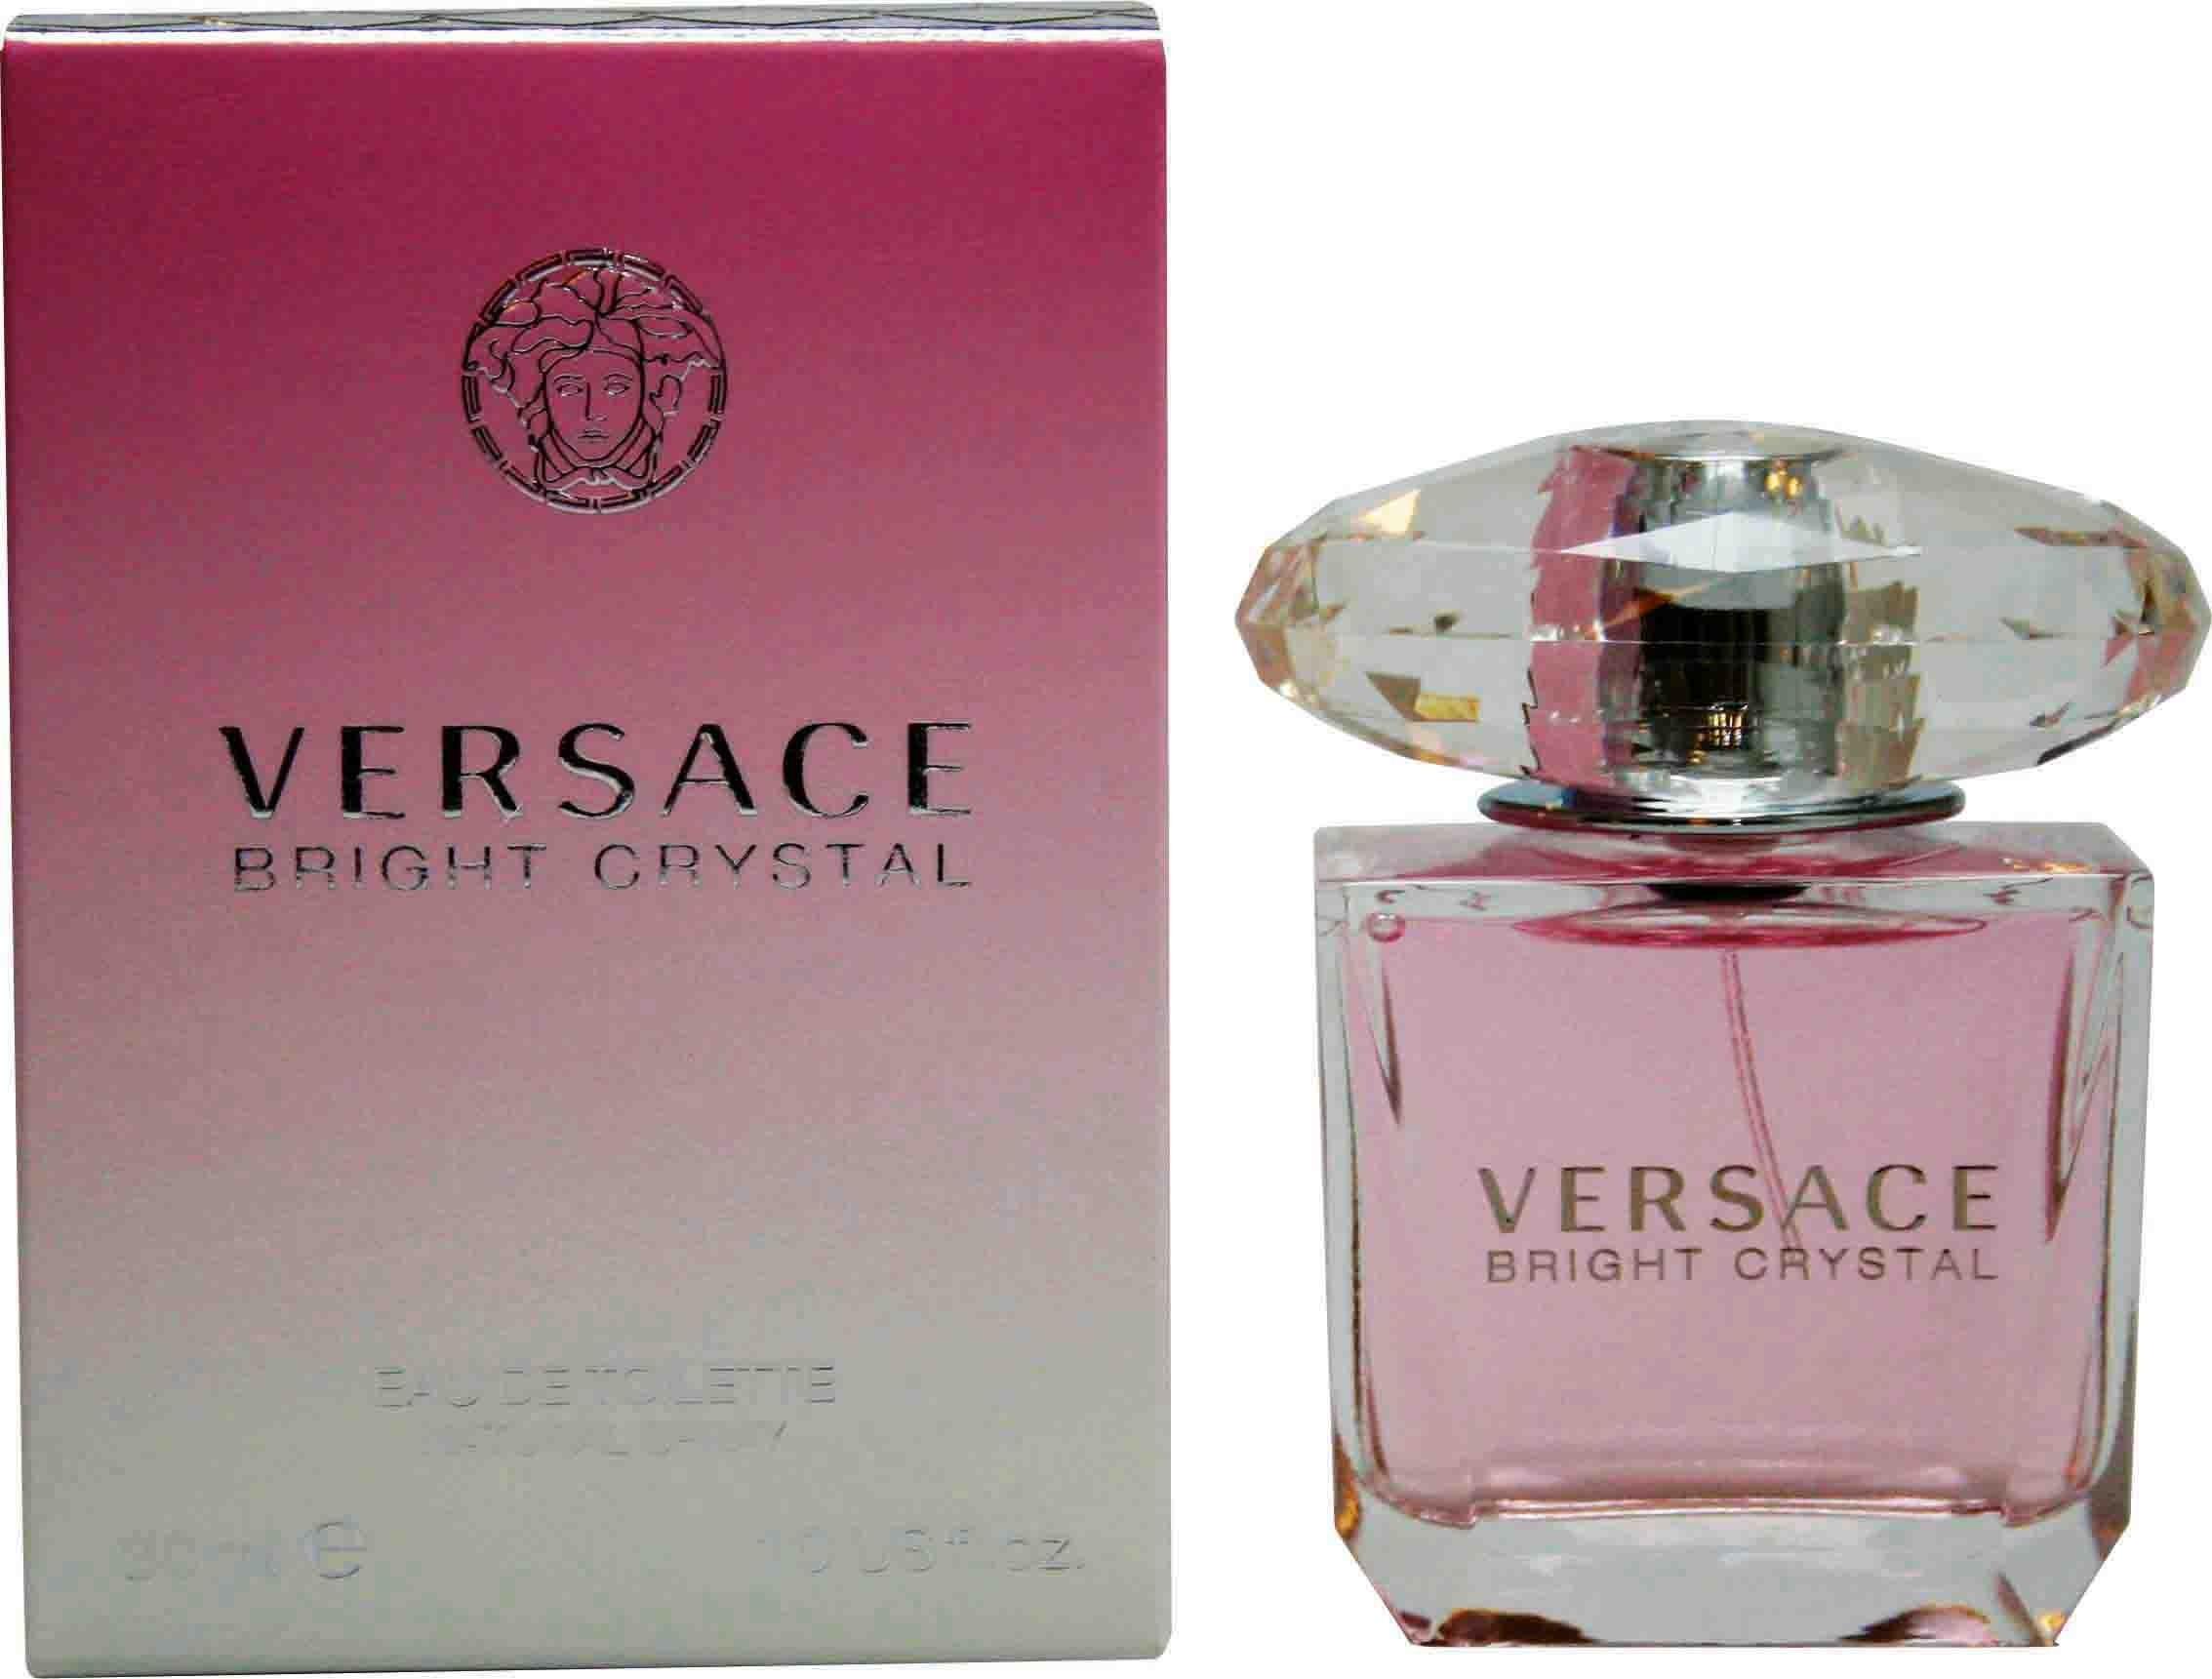 Versace Bright Crystal аромат для женщин